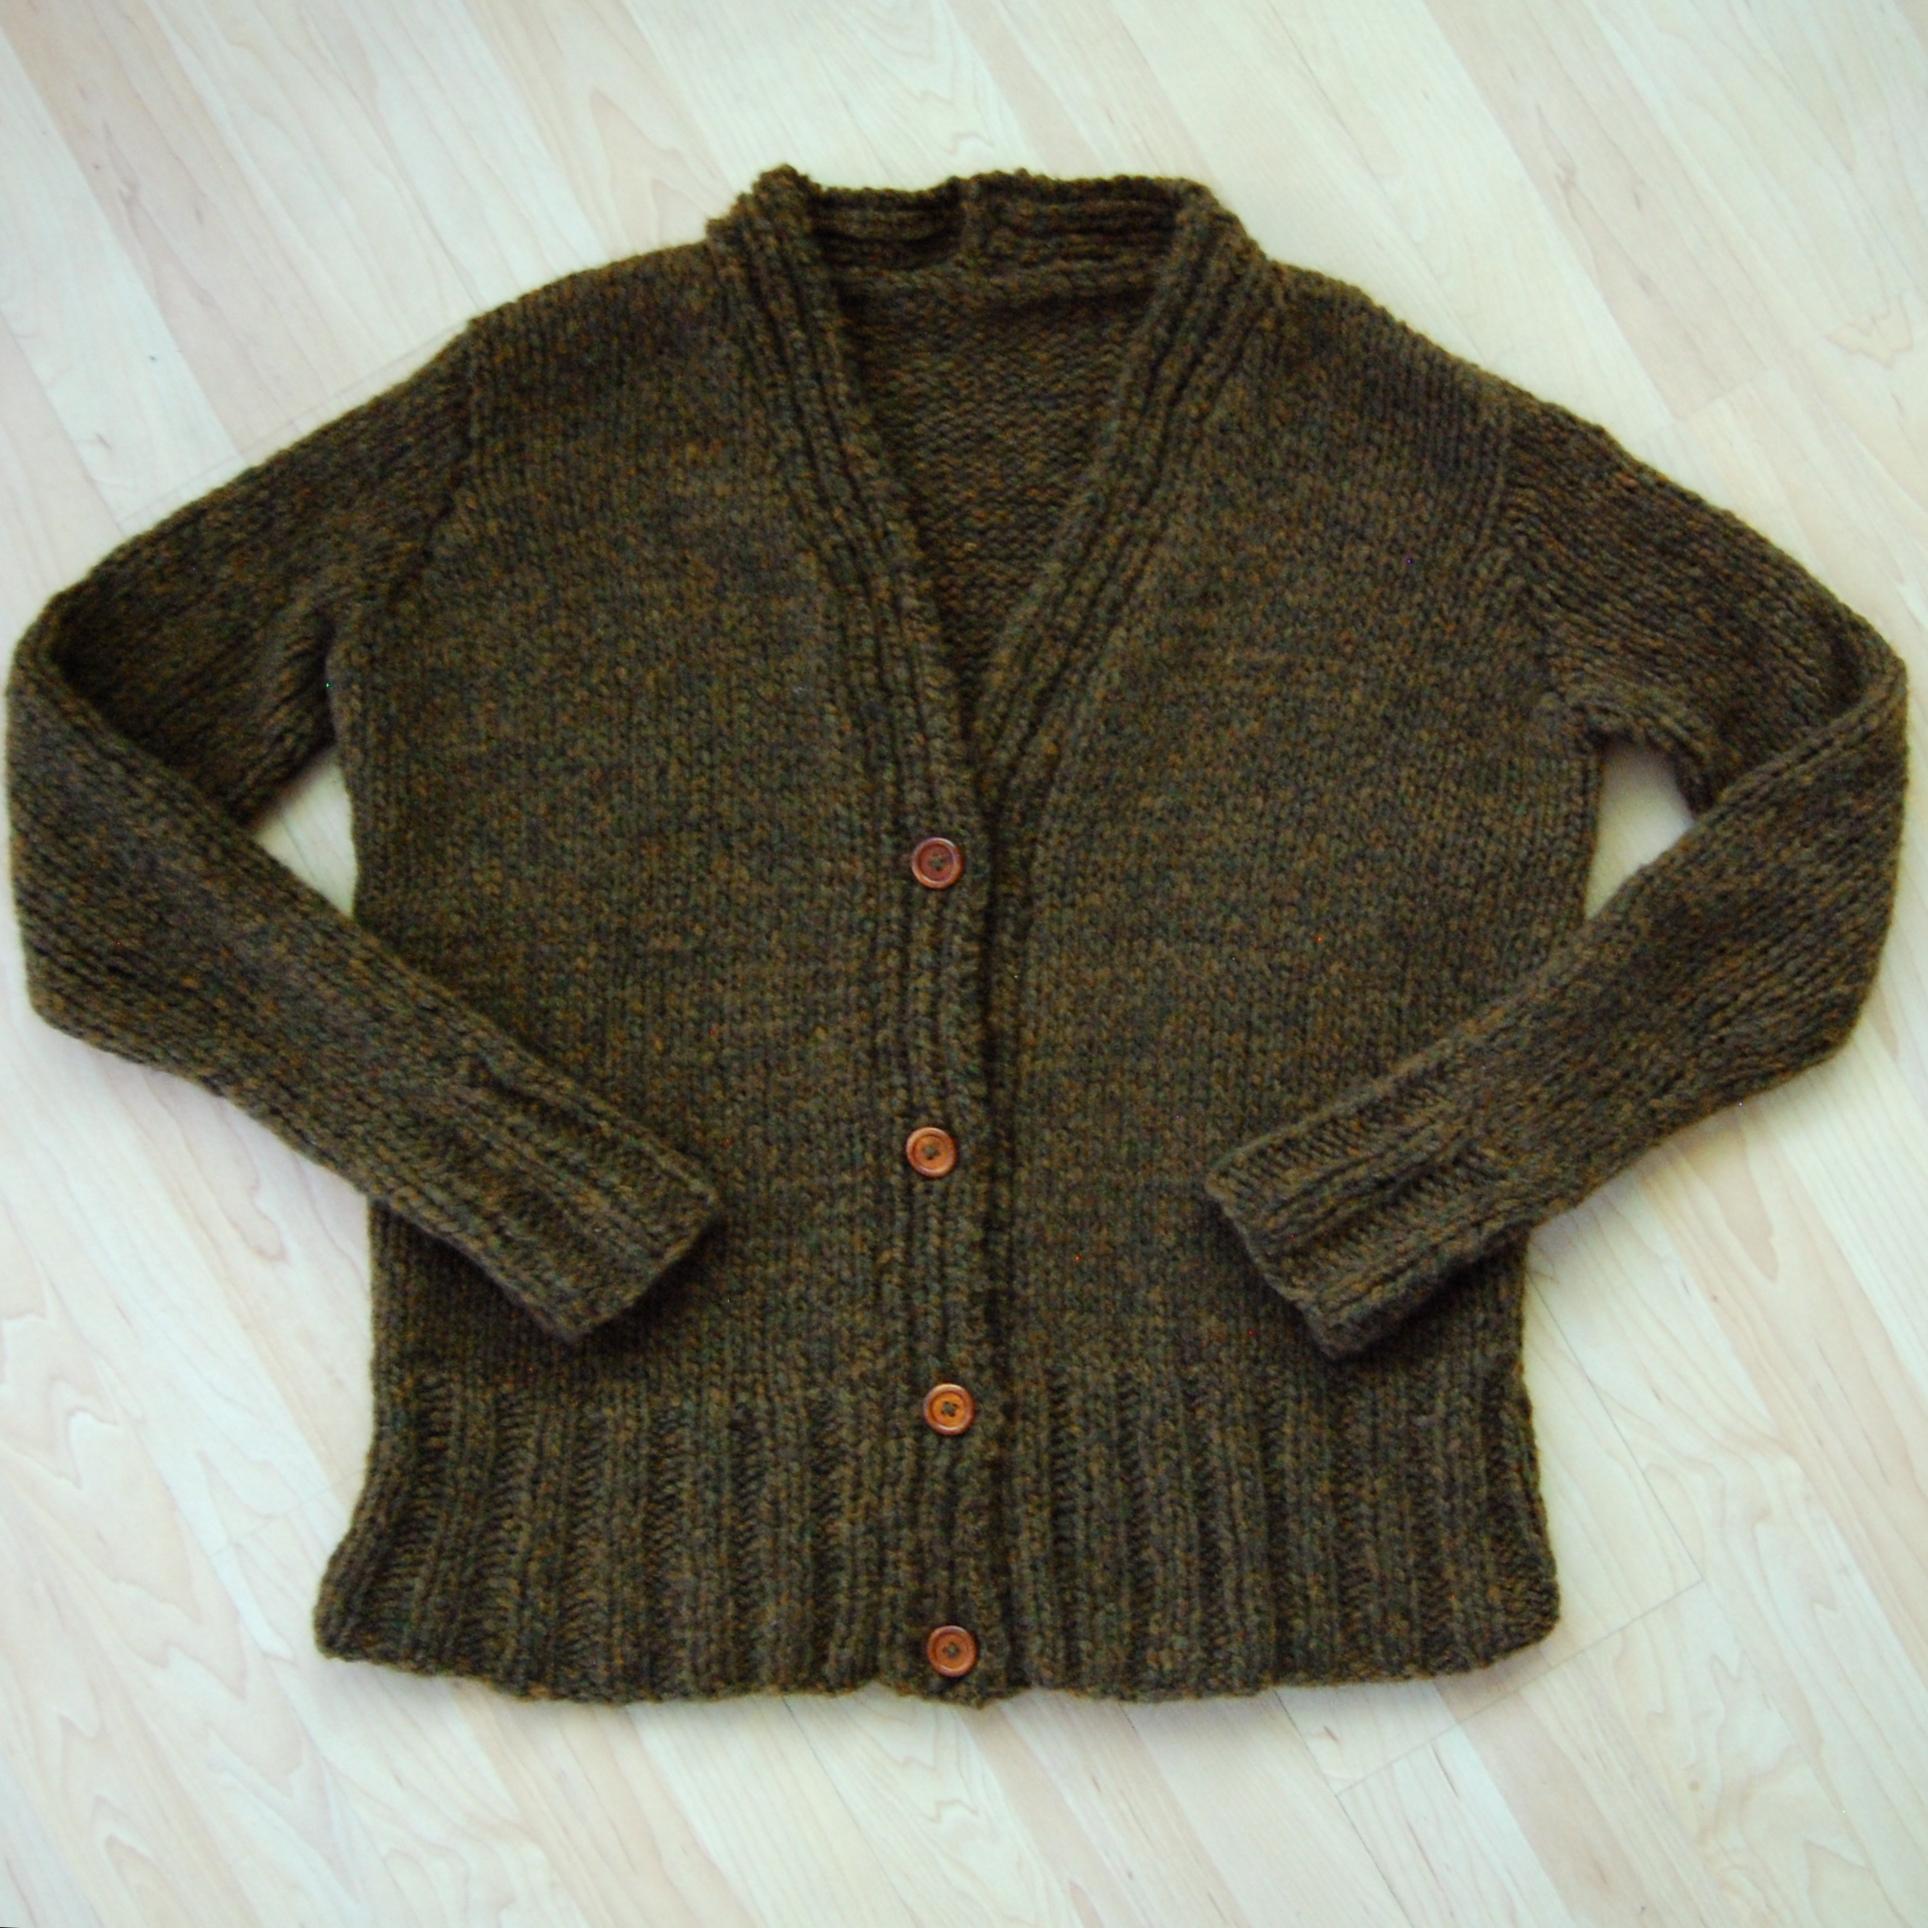 martin storey — Blog — jen geigley knits